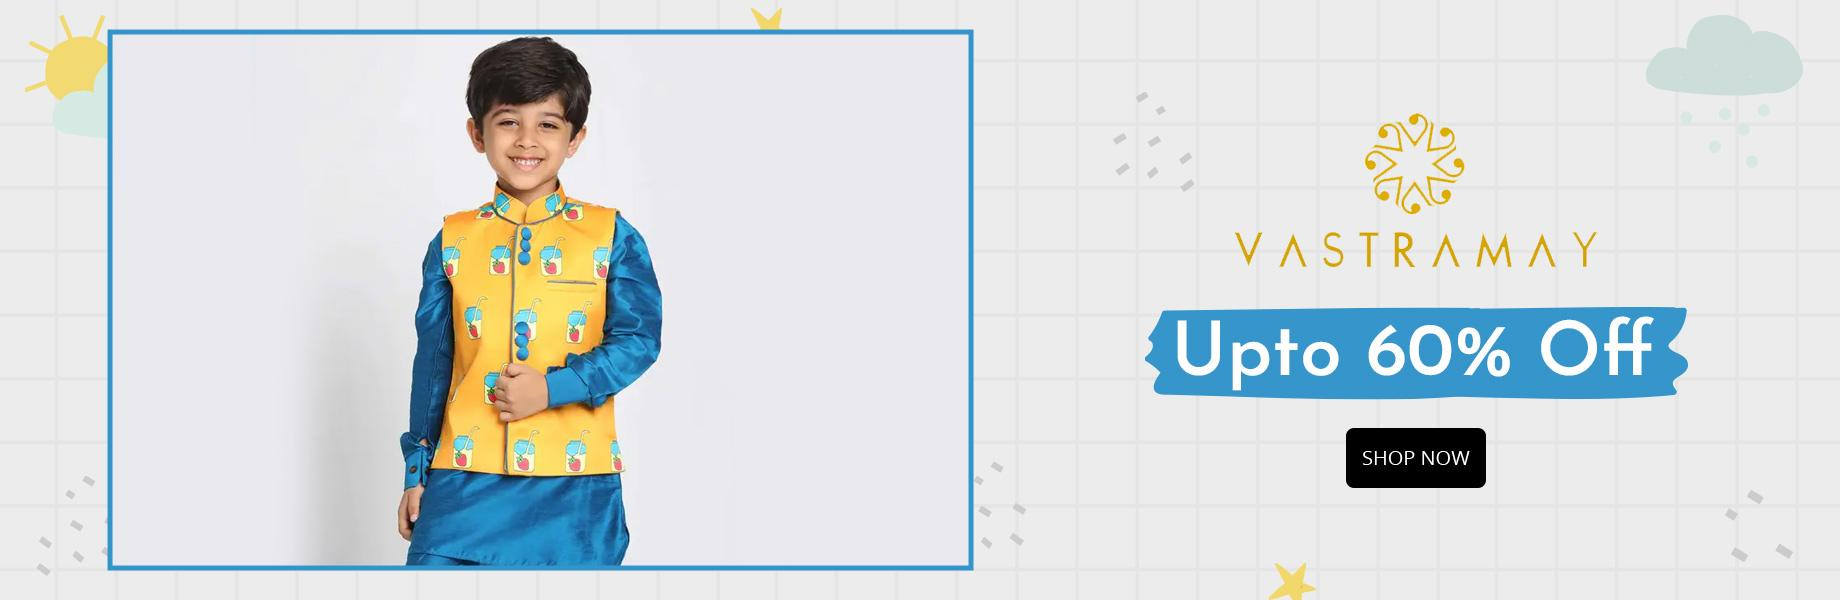 Kids-Page-Iconic-Brands-Static-Vastramay-Web.jpg